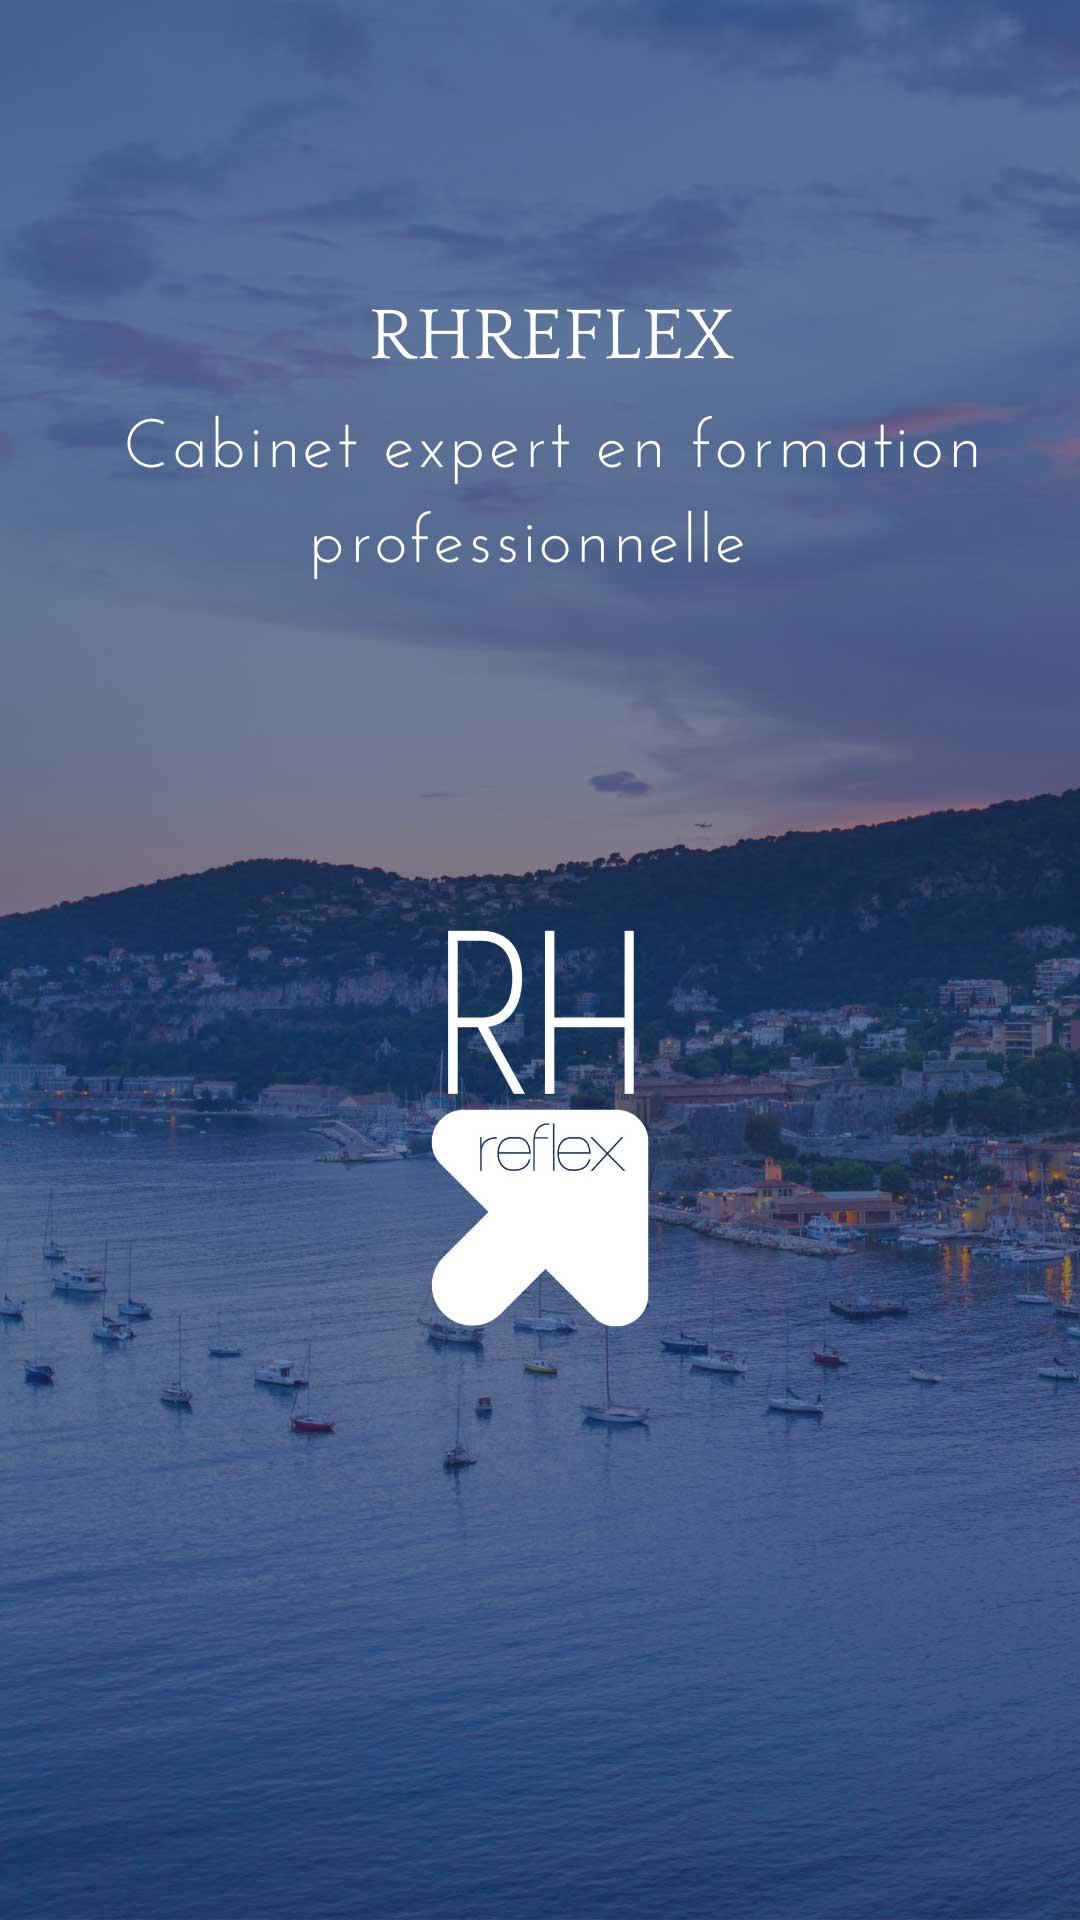 RH REFLEX cabinet expert en formation professionnelle Nice 06